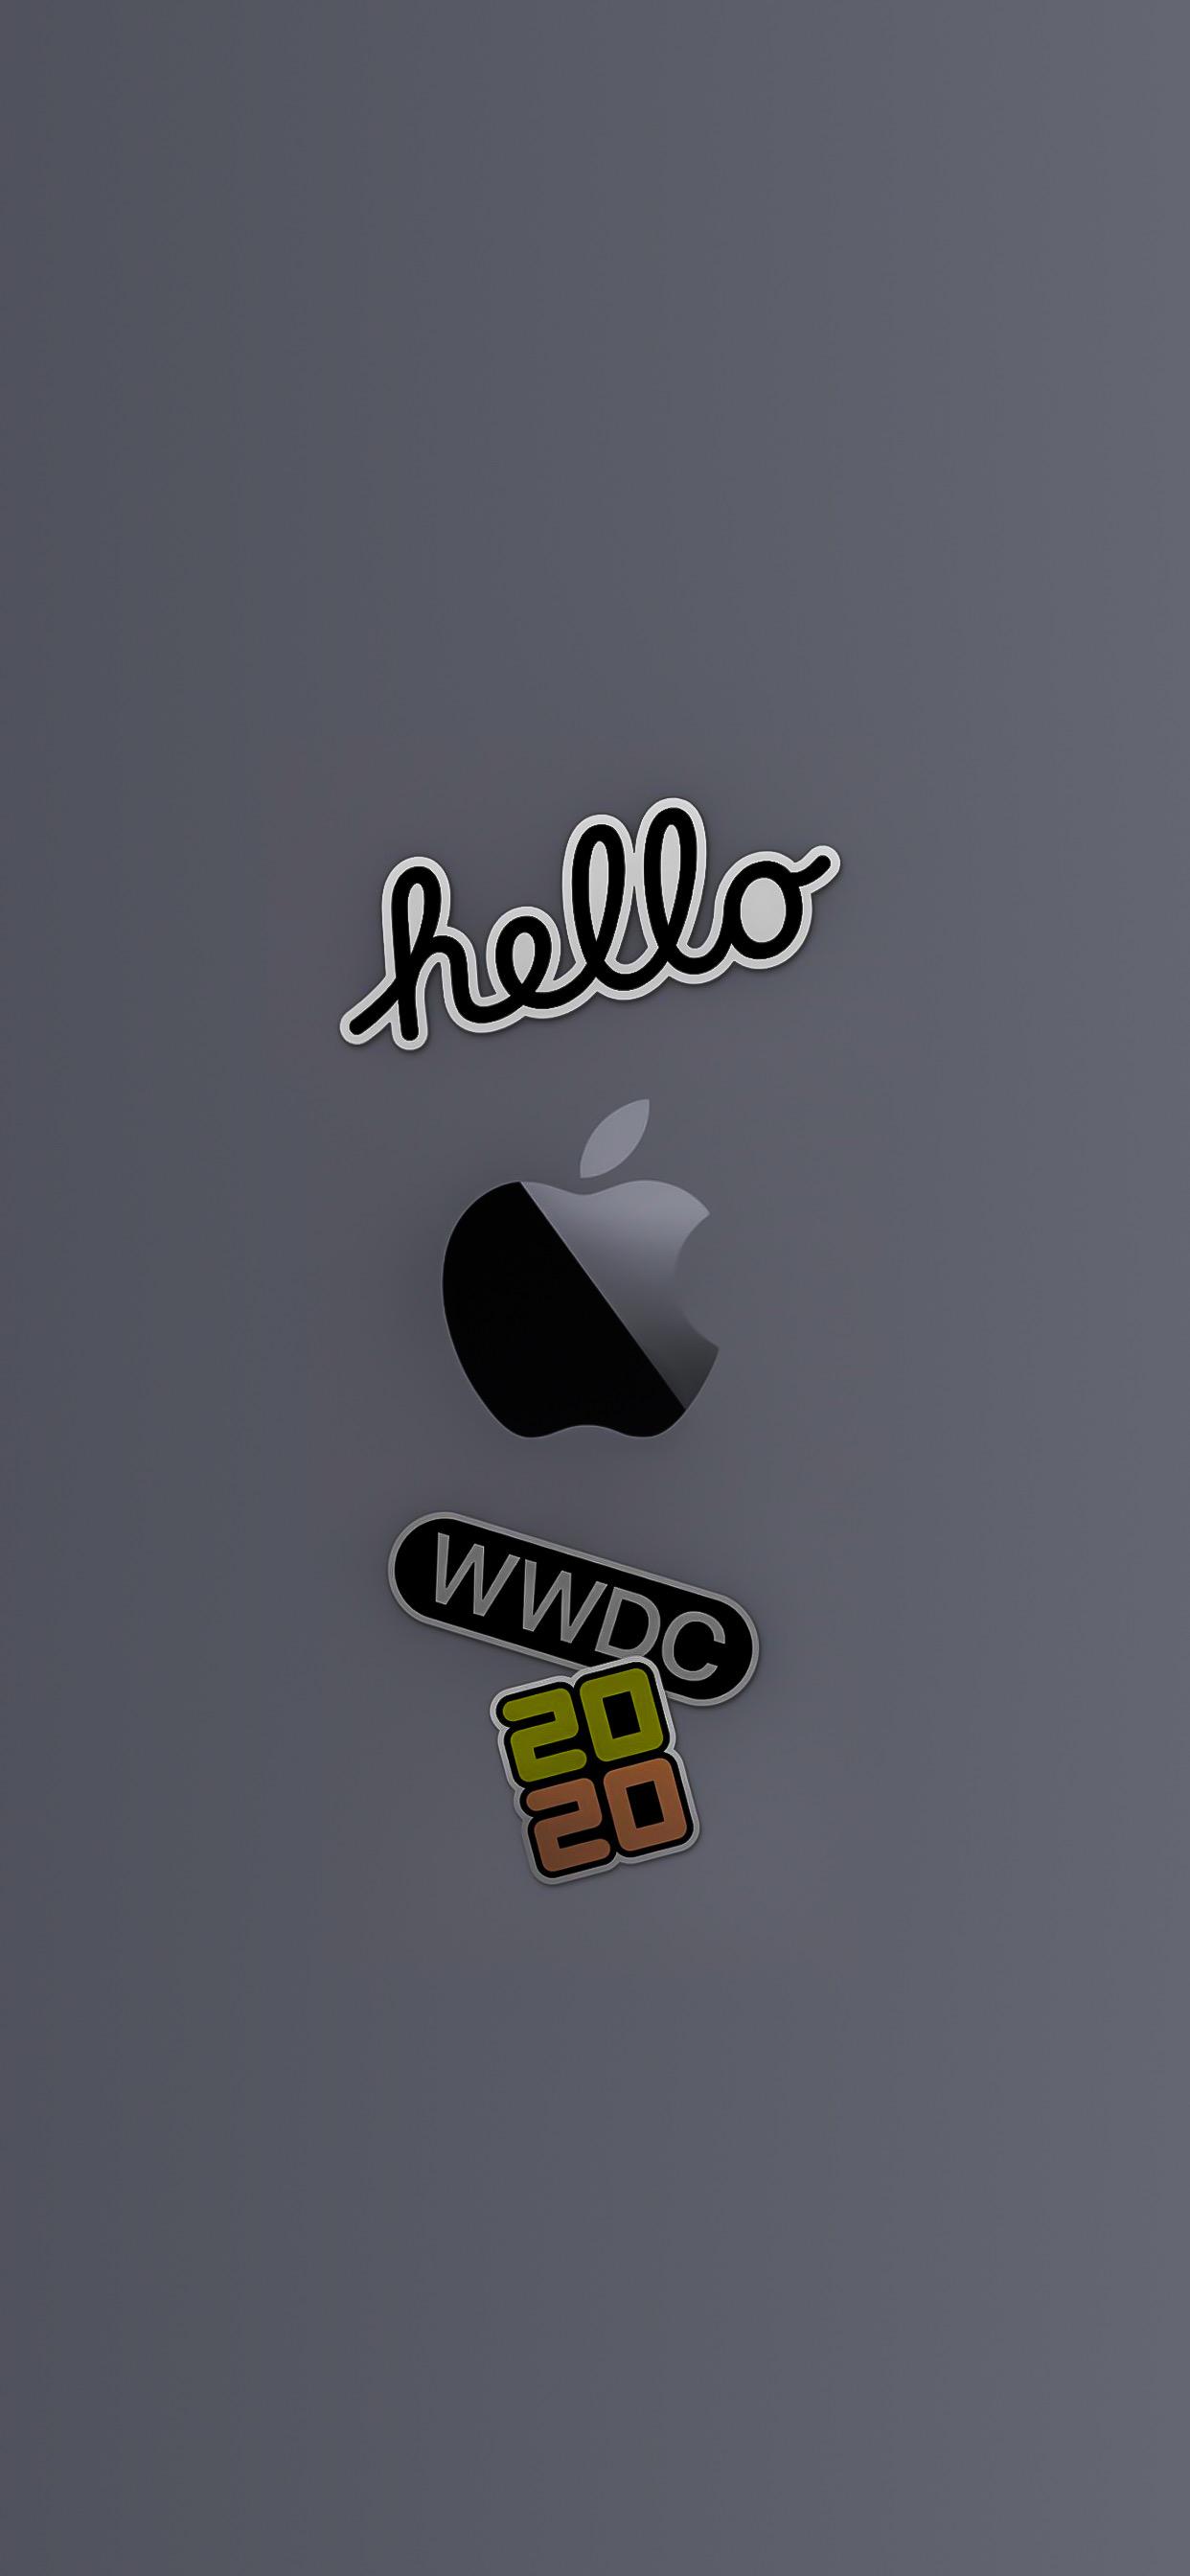 wwdc 2020 wallpaper iphone ar72014 idownloadblog apple logo space gray